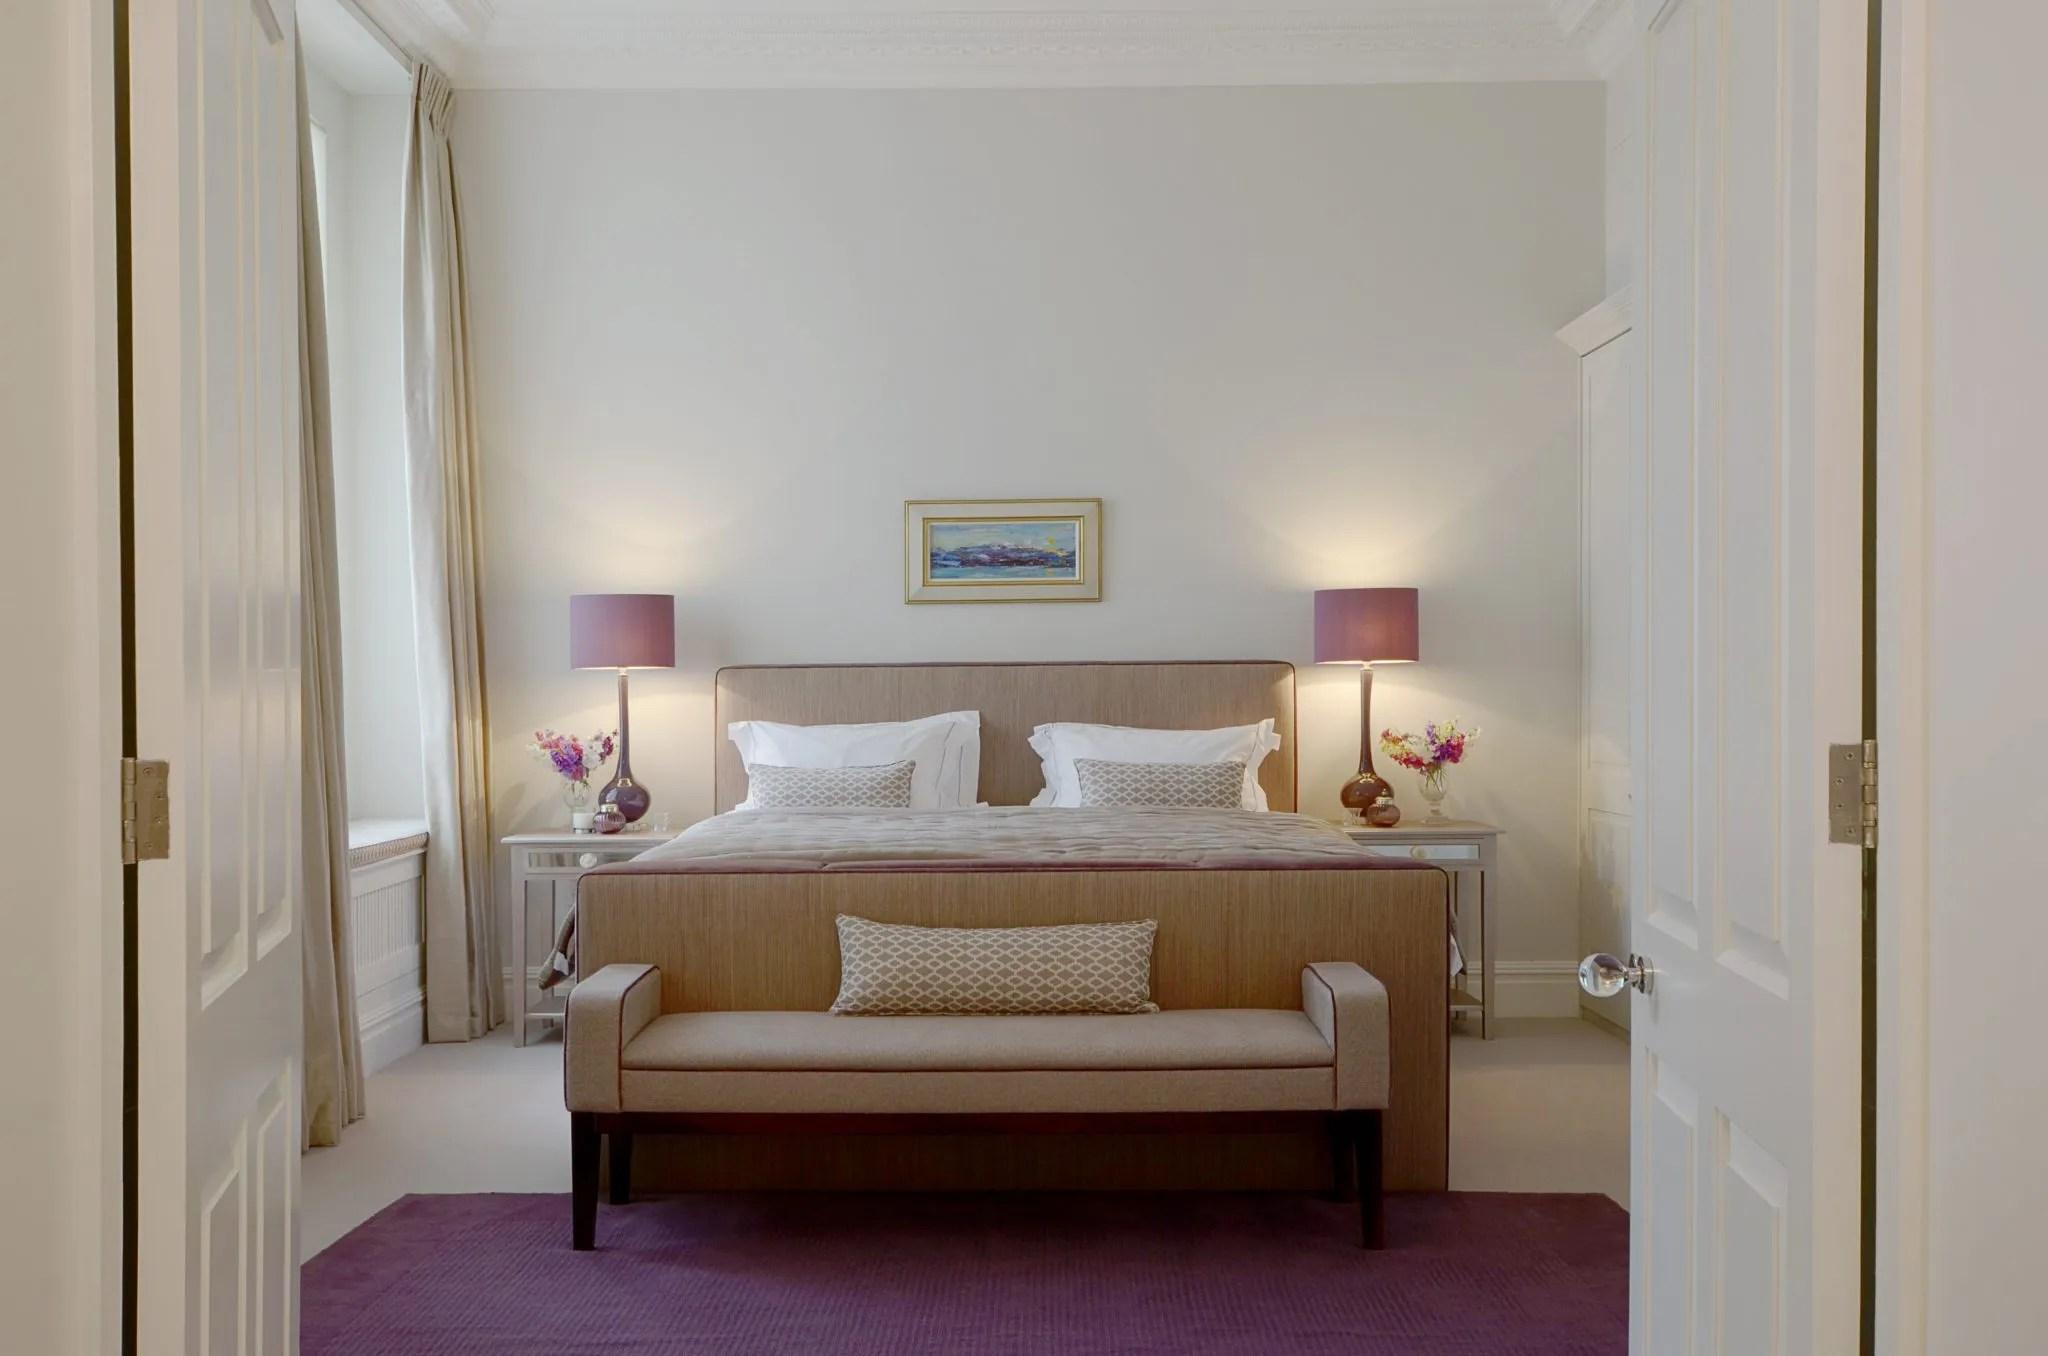 Kelling Designs Master Bedroom Interior Design Idea